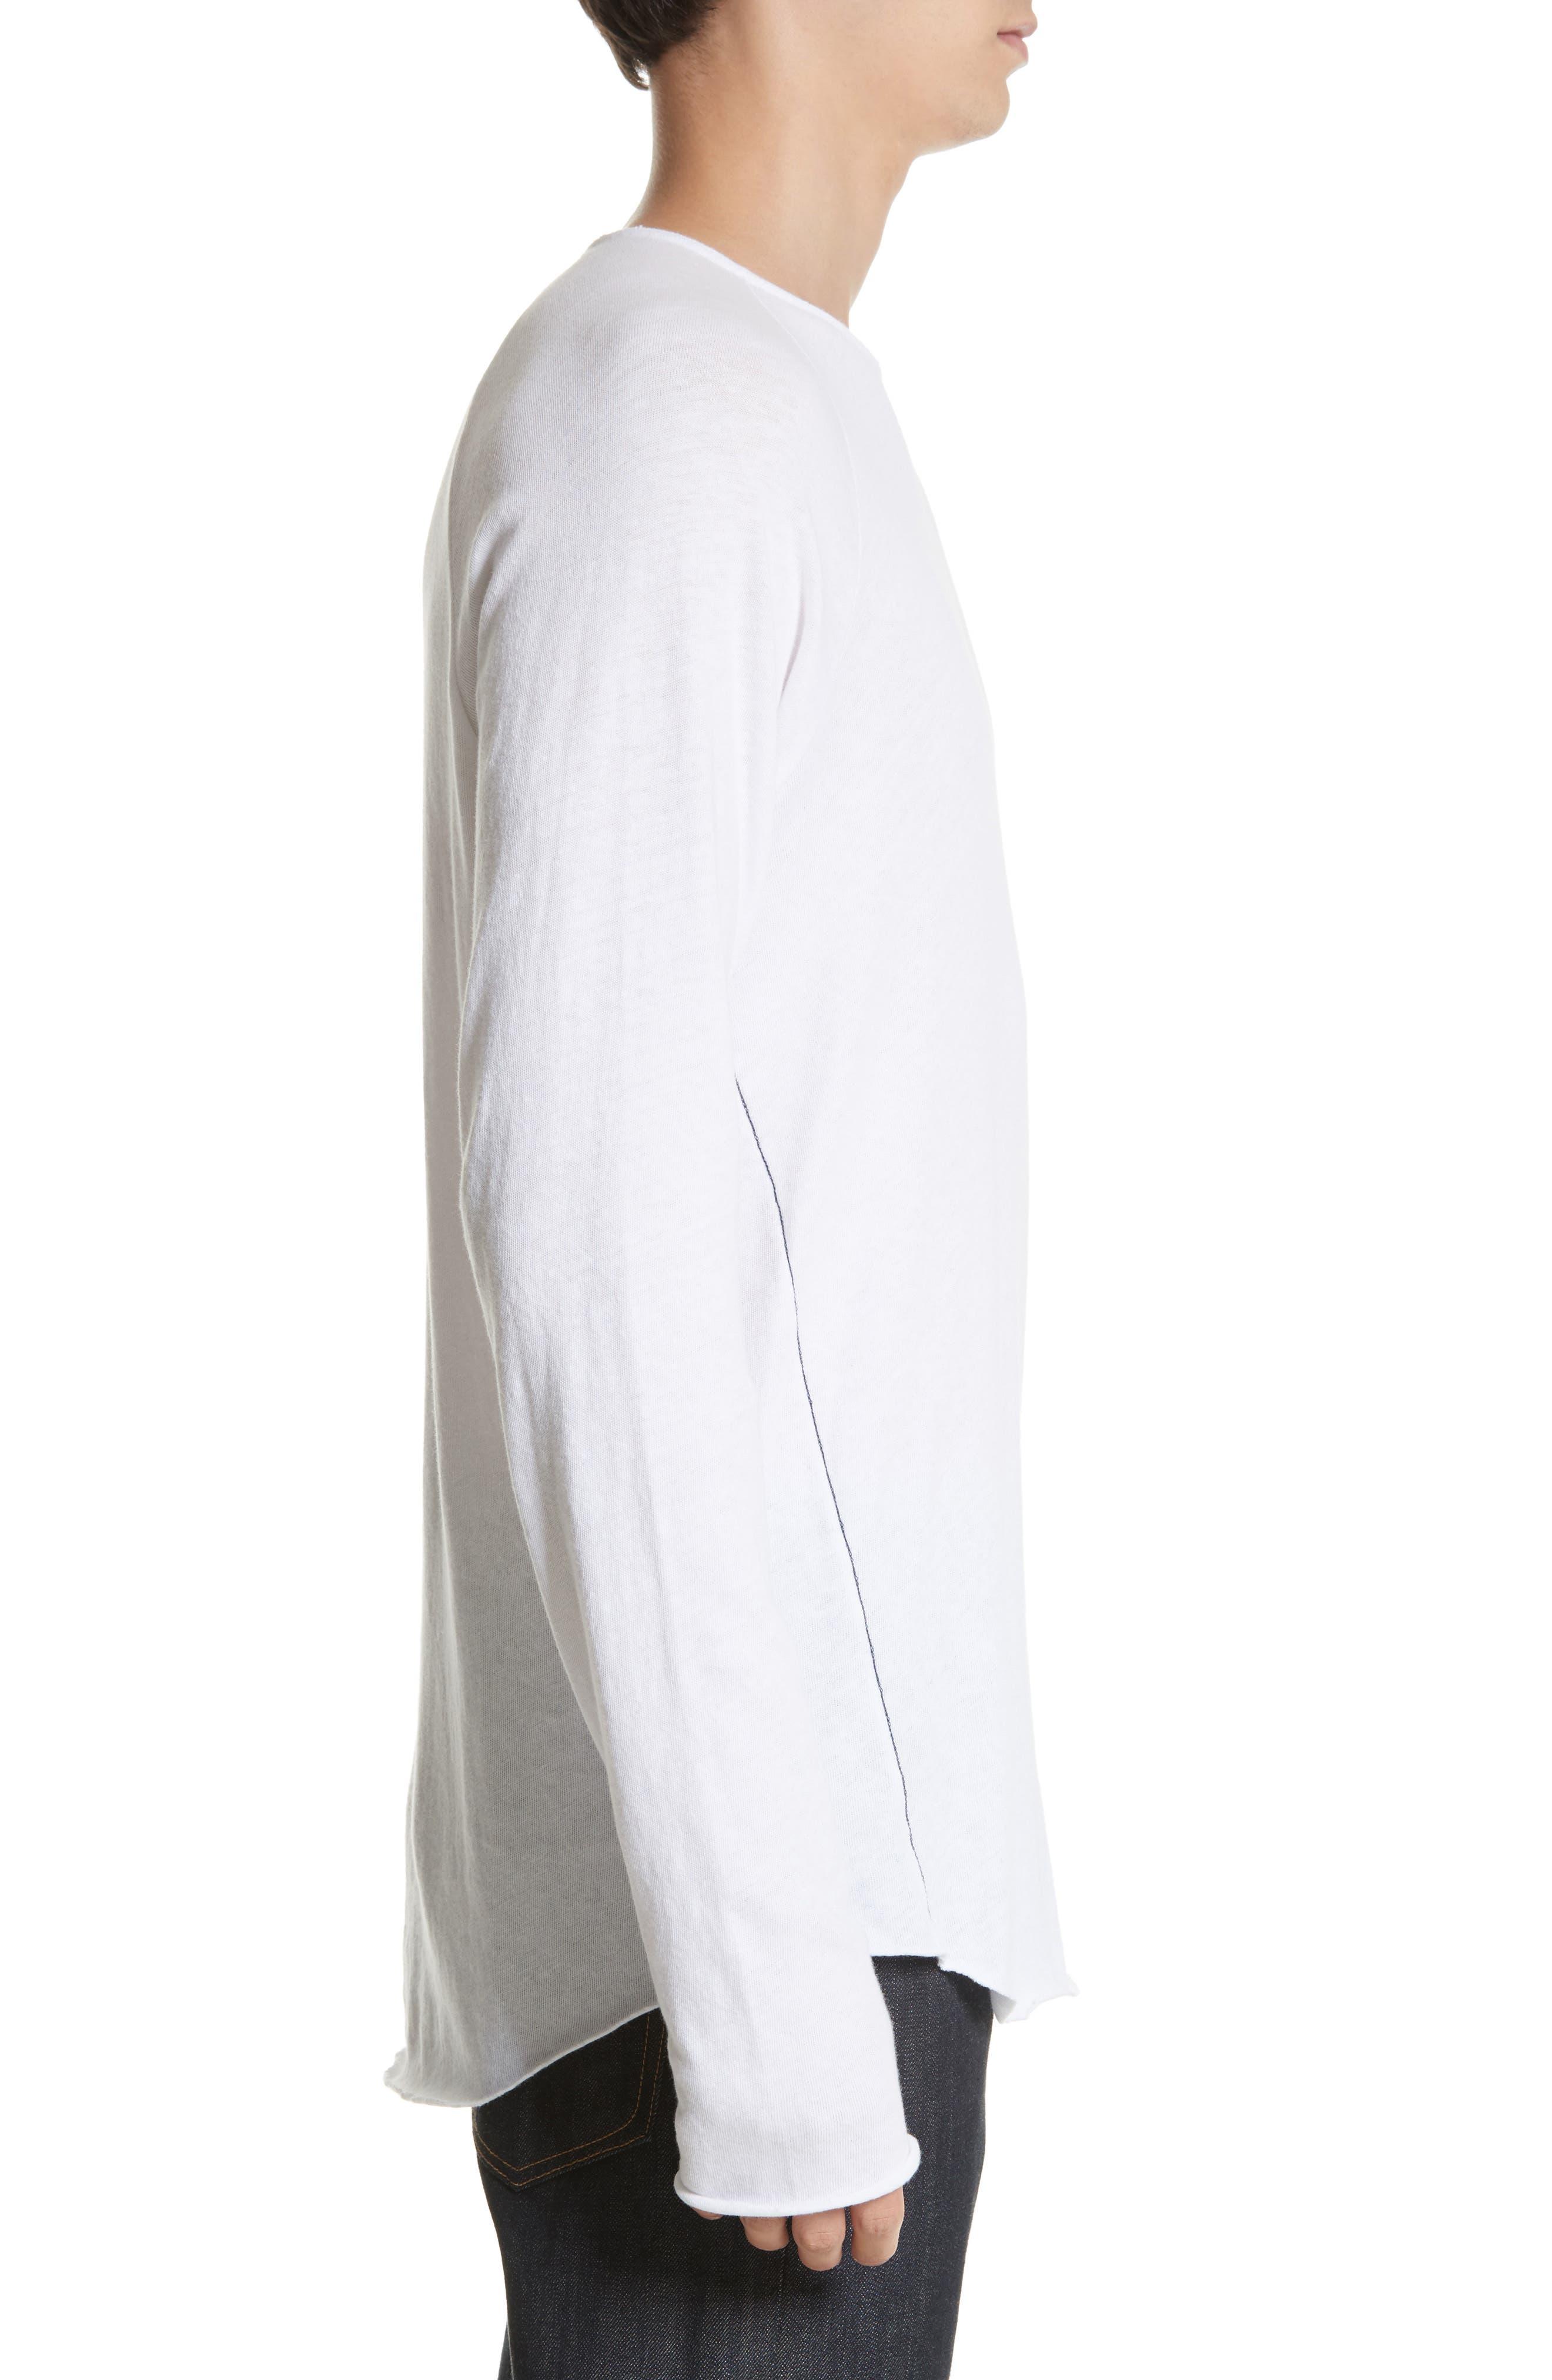 Rupert Long Sleeve T-Shirt,                             Alternate thumbnail 3, color,                             100